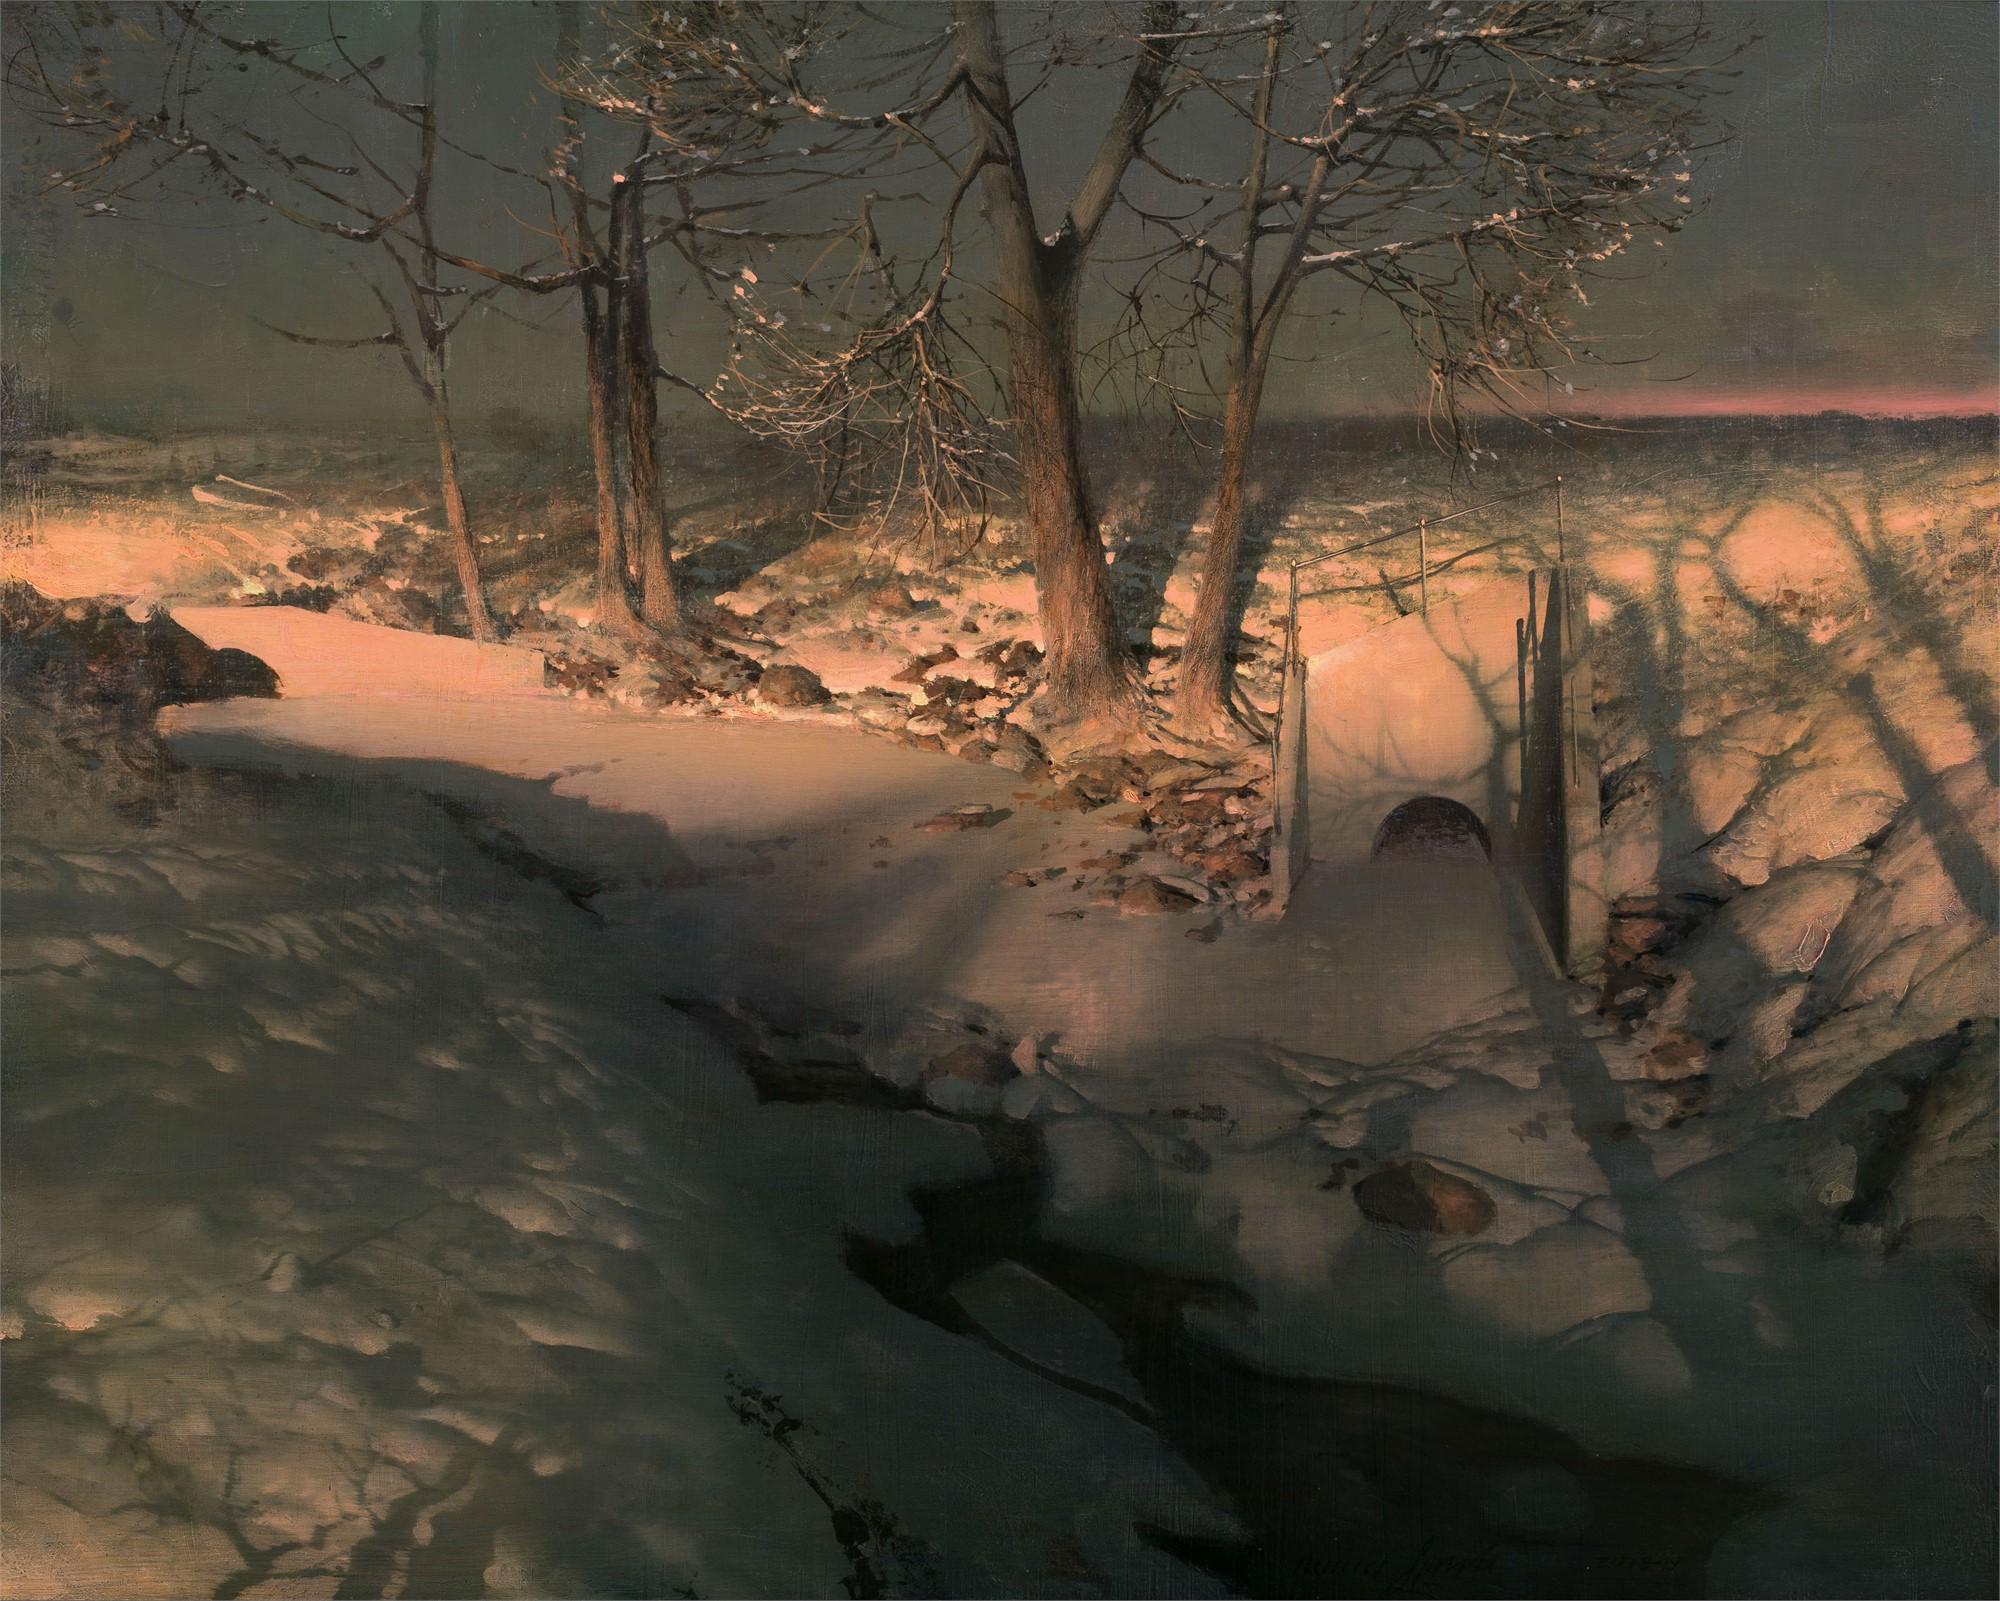 Sanderson Gulch by Daniel Sprick